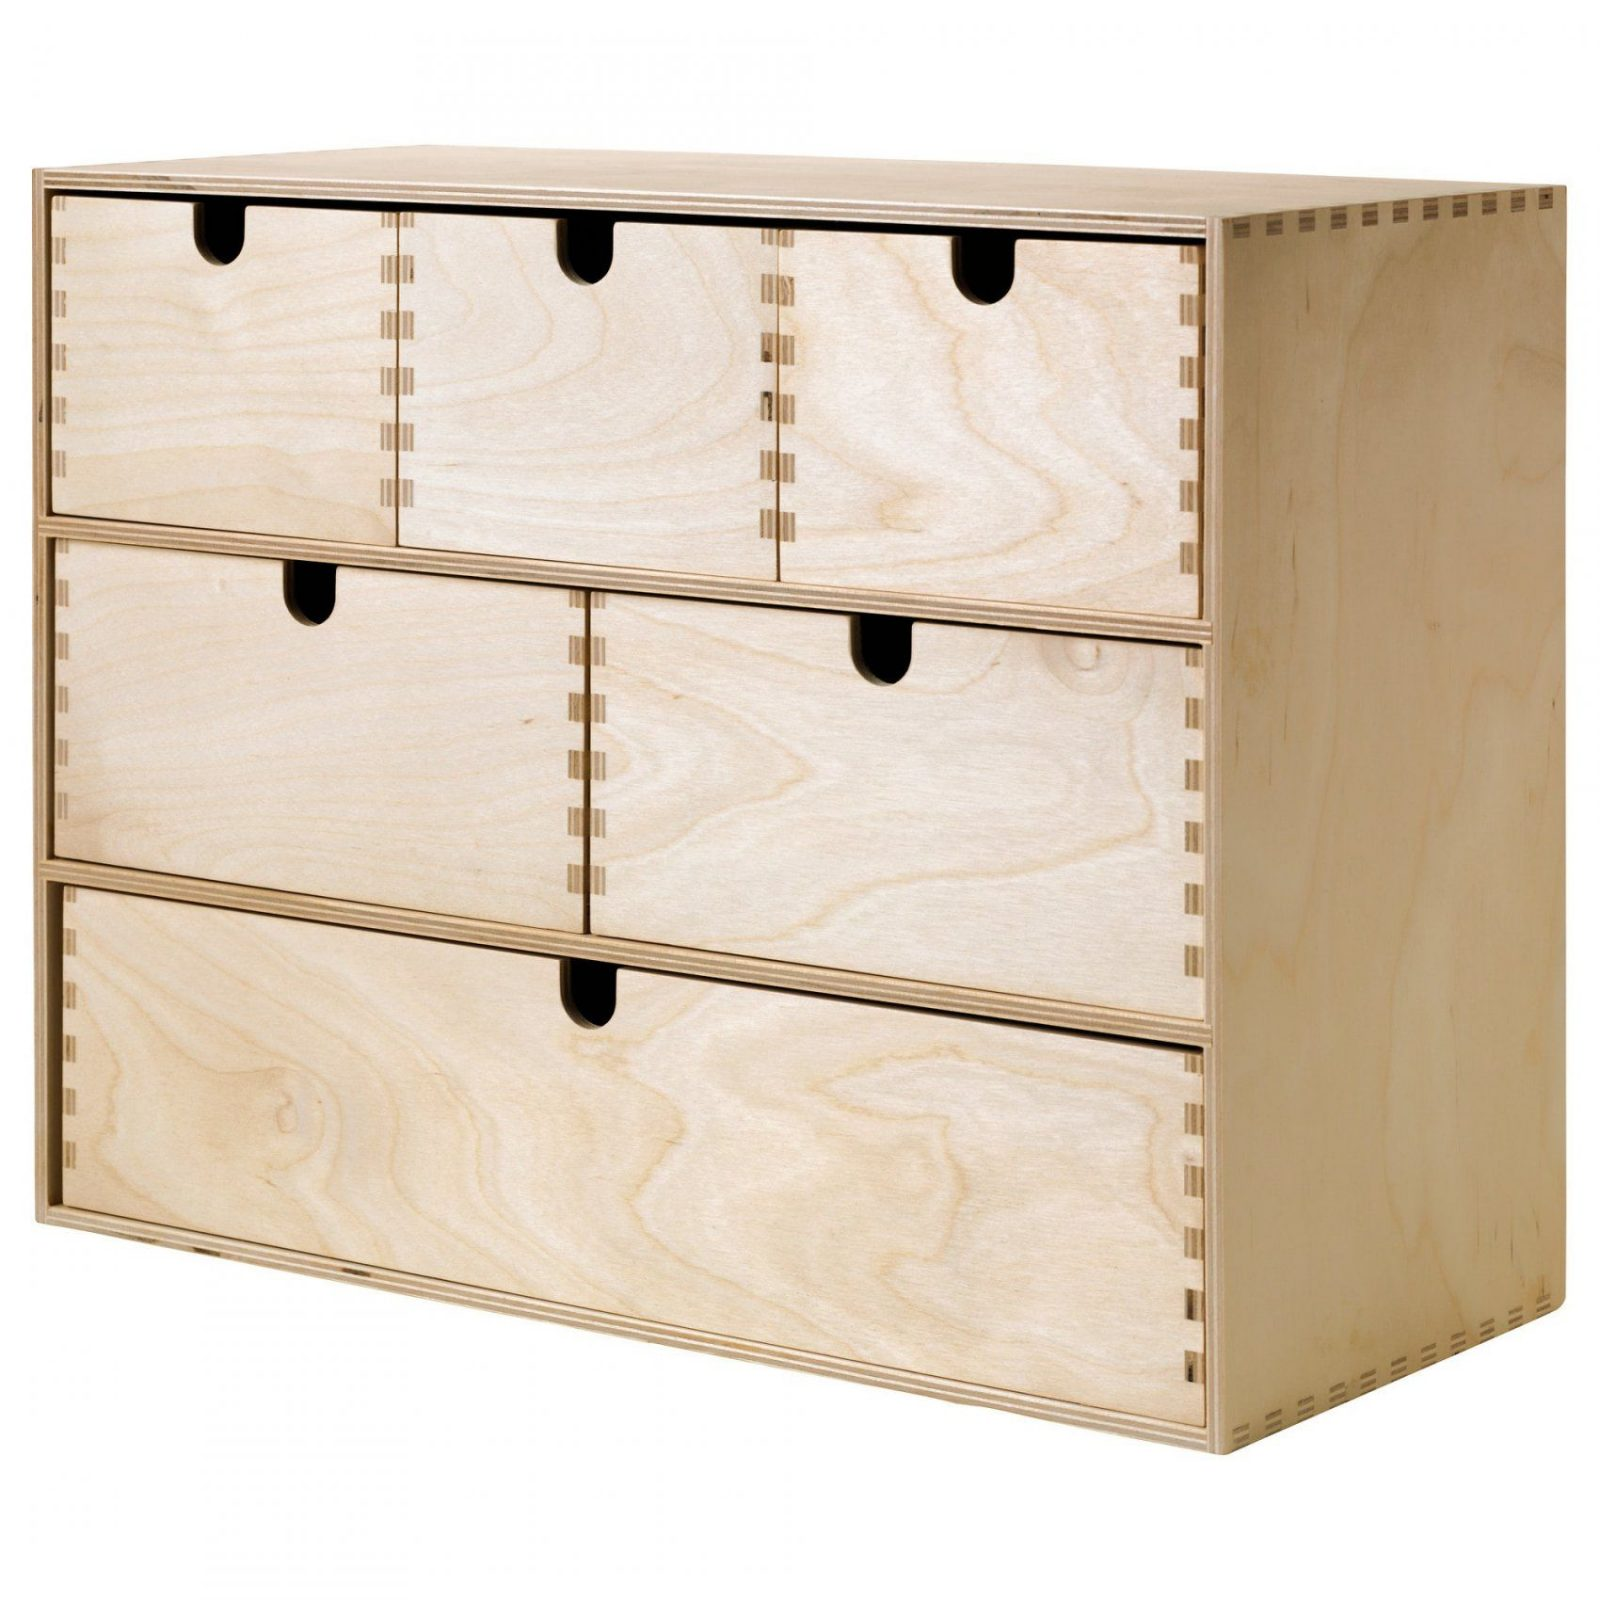 Moppe Minikommode  Ikea von Holzkiste Mit Deckel Ikea Photo